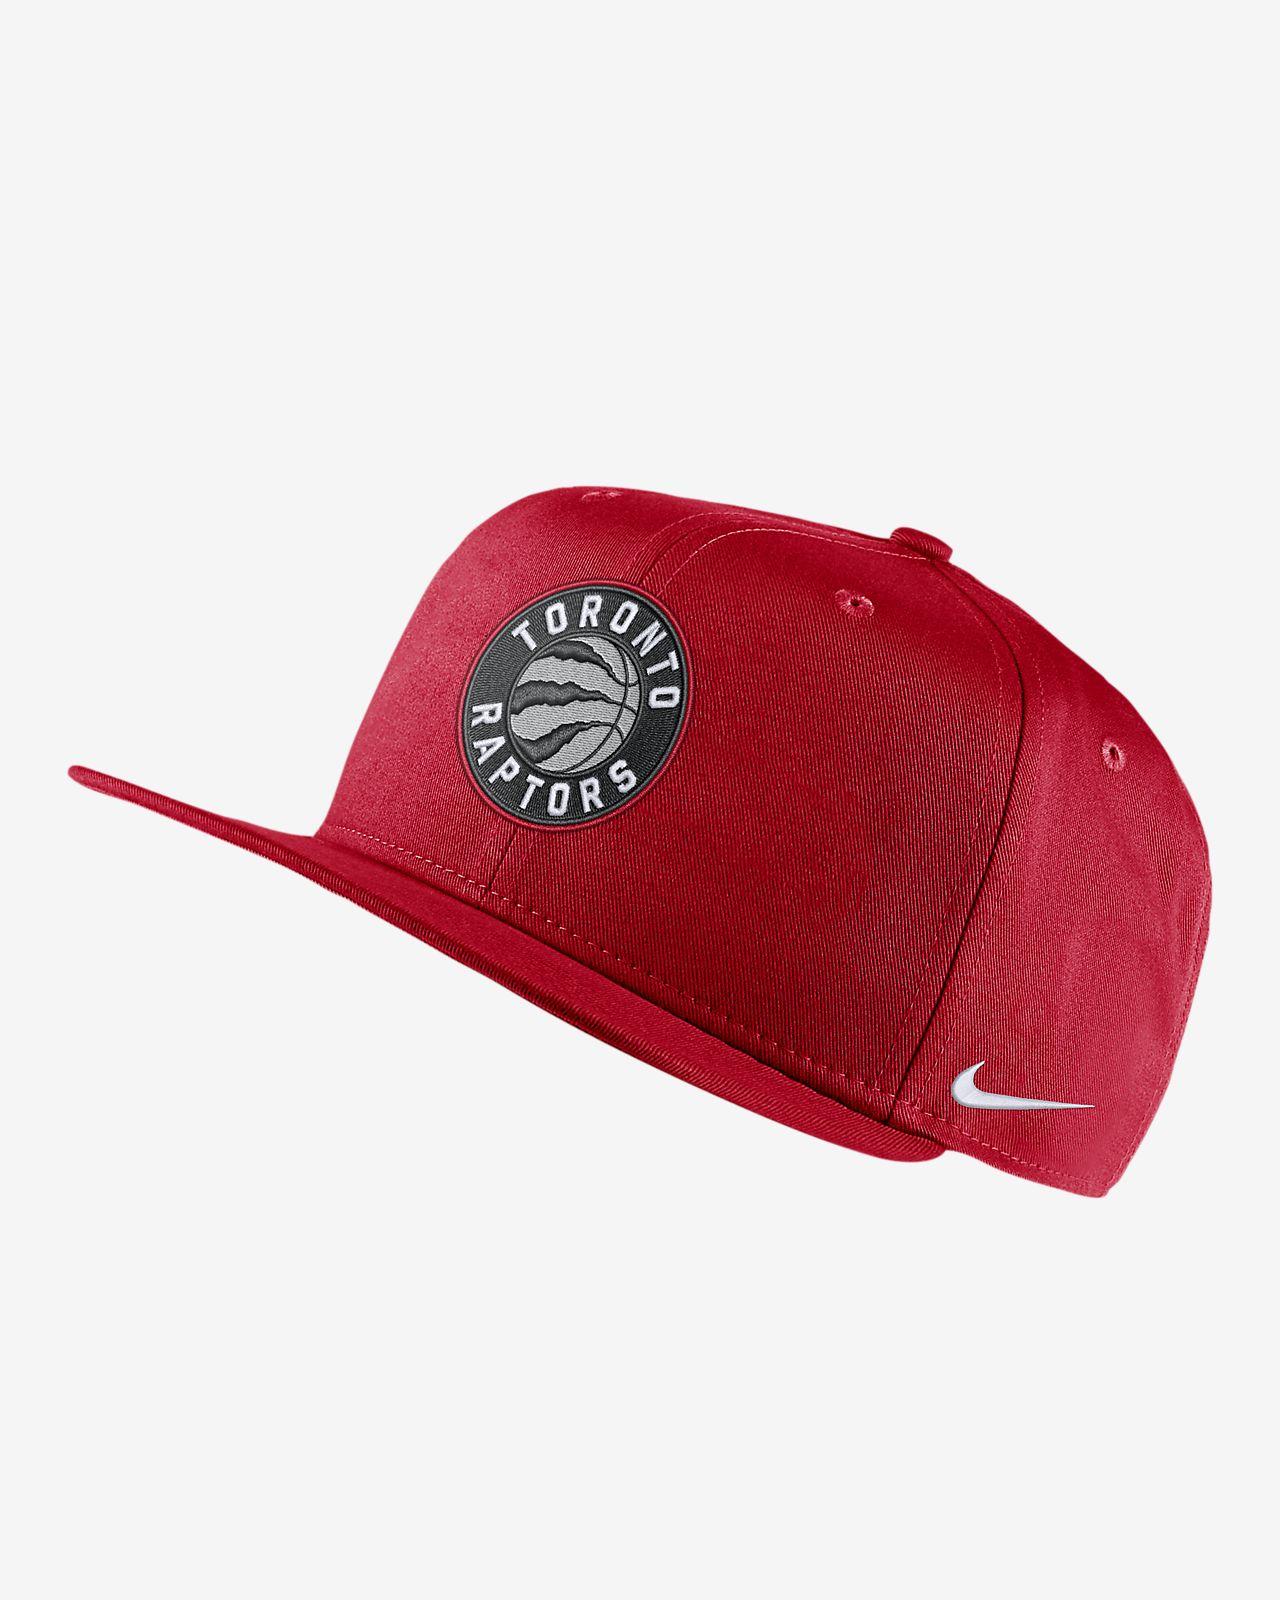 Toronto Raptors Nike Pro NBA-kasket